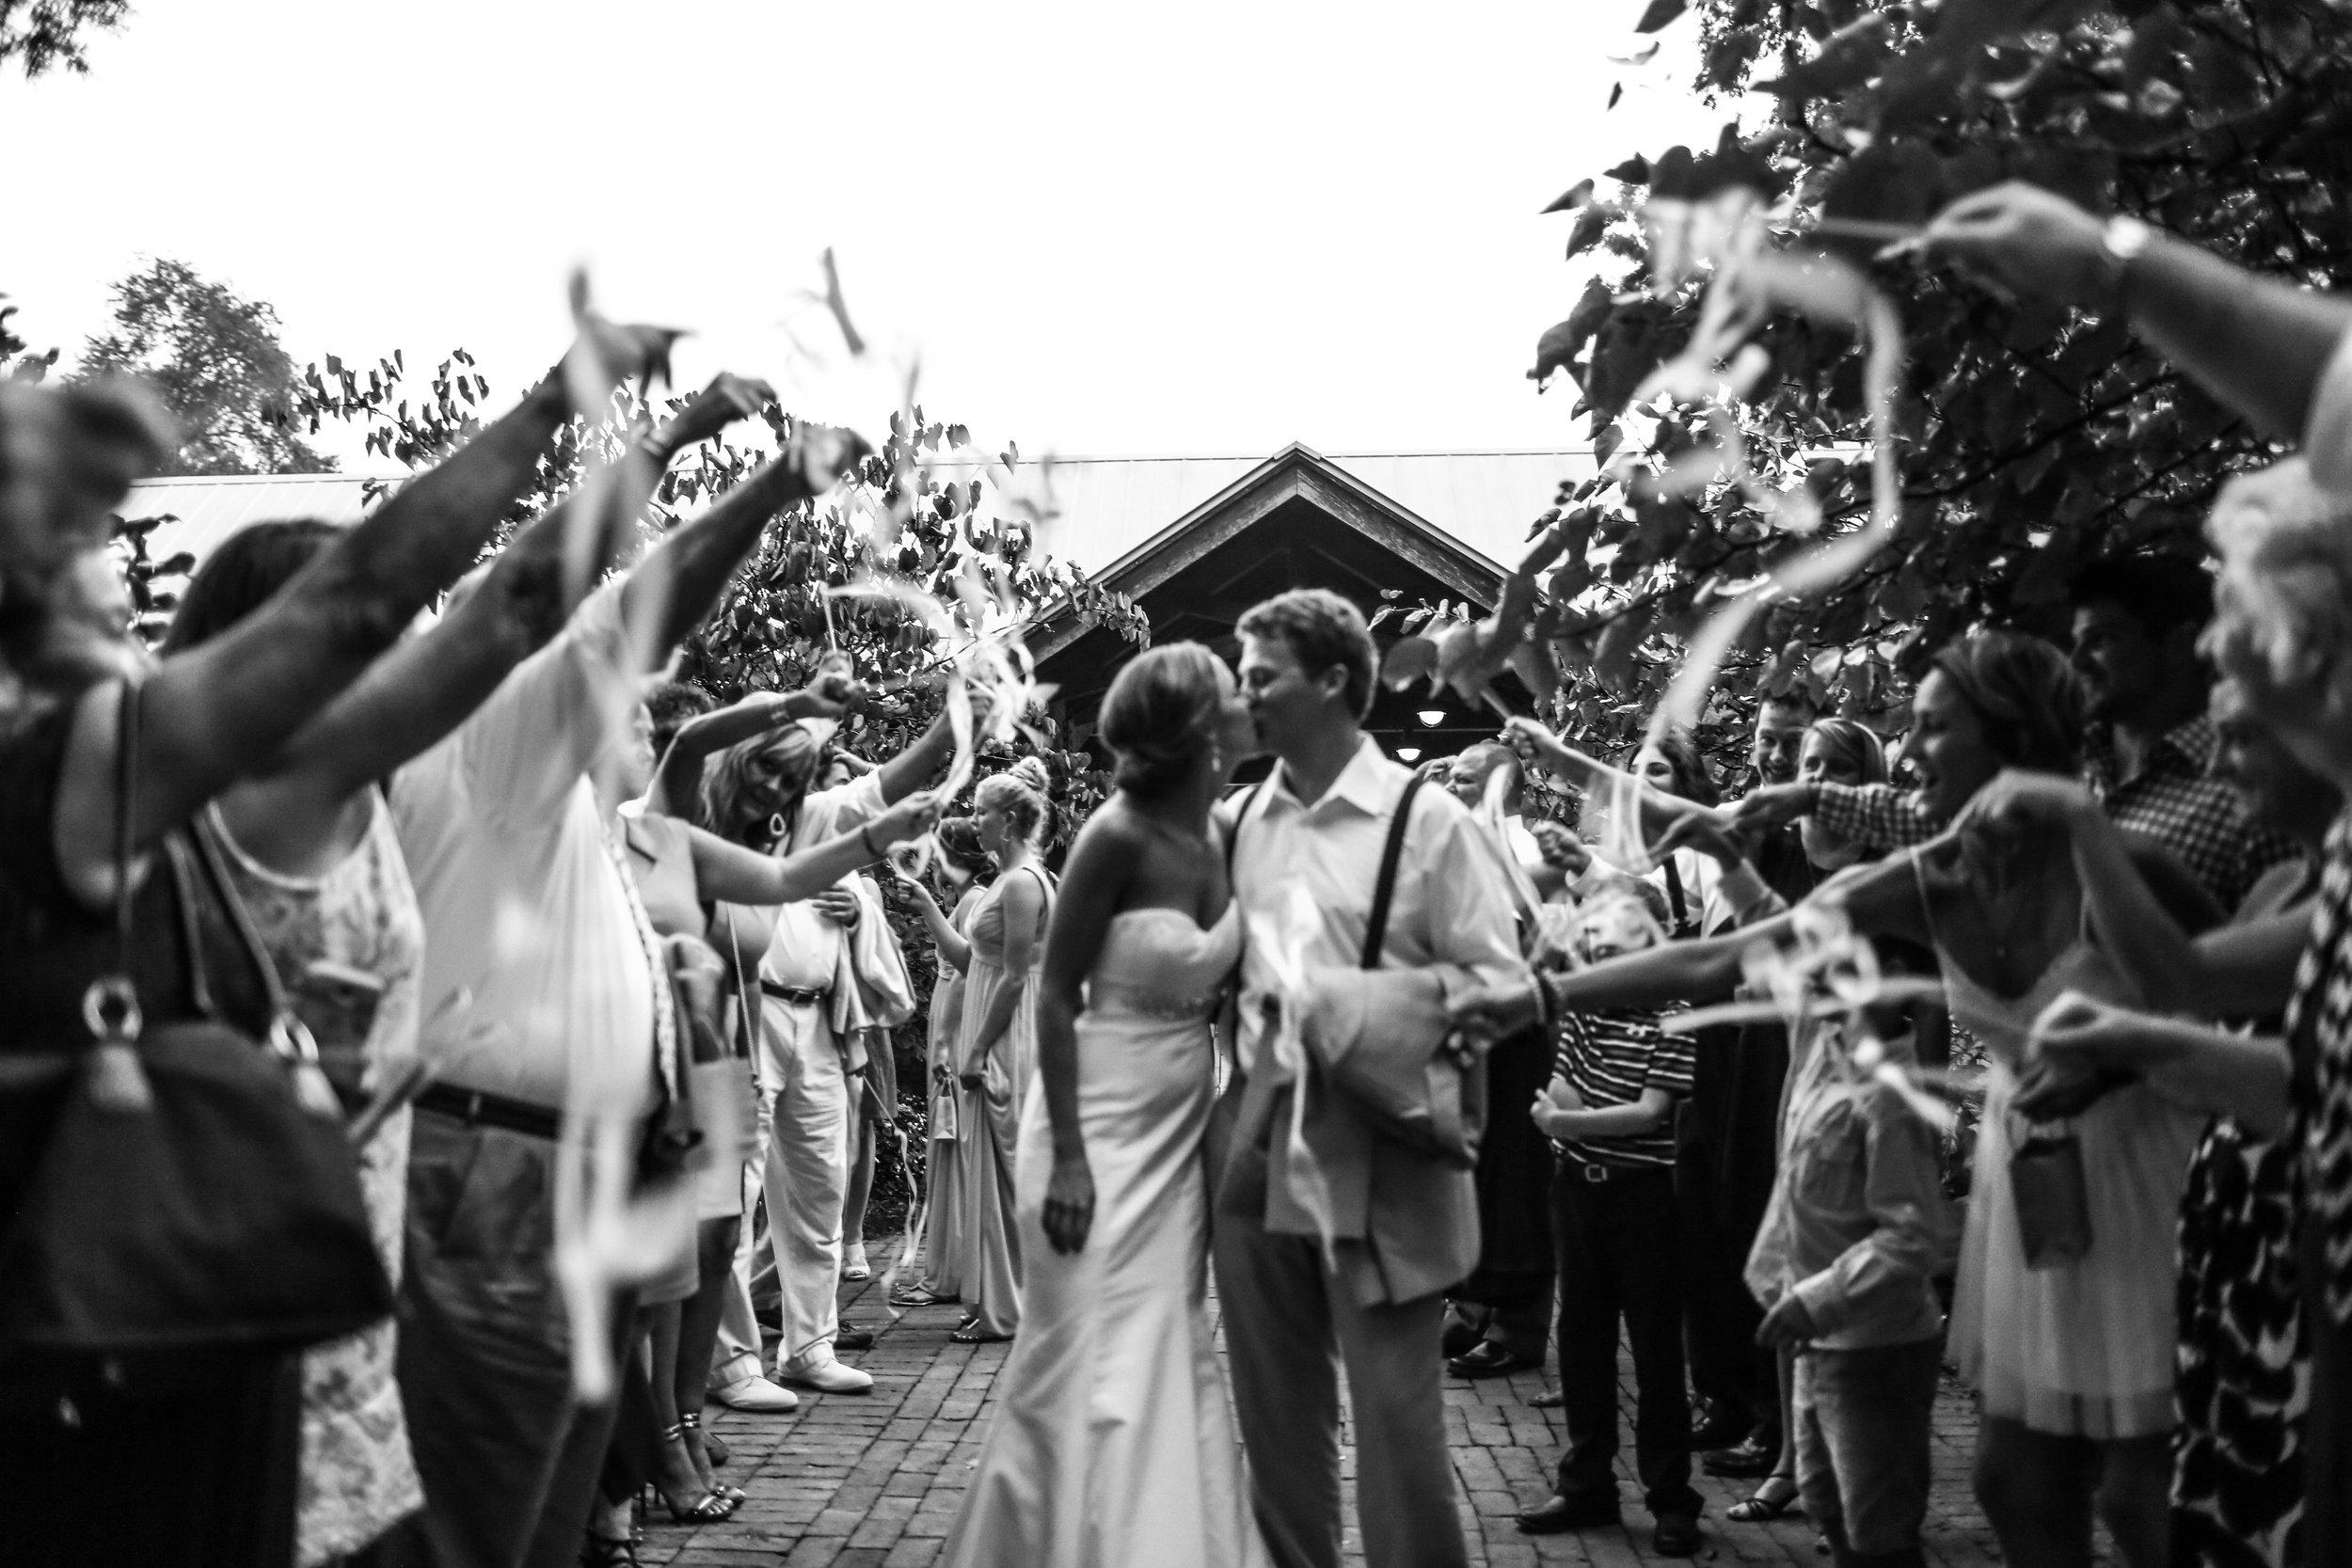 finnegan-photography-ivory-and-beau-bridal-boutique-nicole-miller-dakota-jaclyn-jordan-anne-veil-savannah-bridal-boutique-savannah-wedding-dresses-savannah-weddings-statesboro-wedding-barn-wedding-savannah-bridal-georgia-bridal-boutique-22.jpg